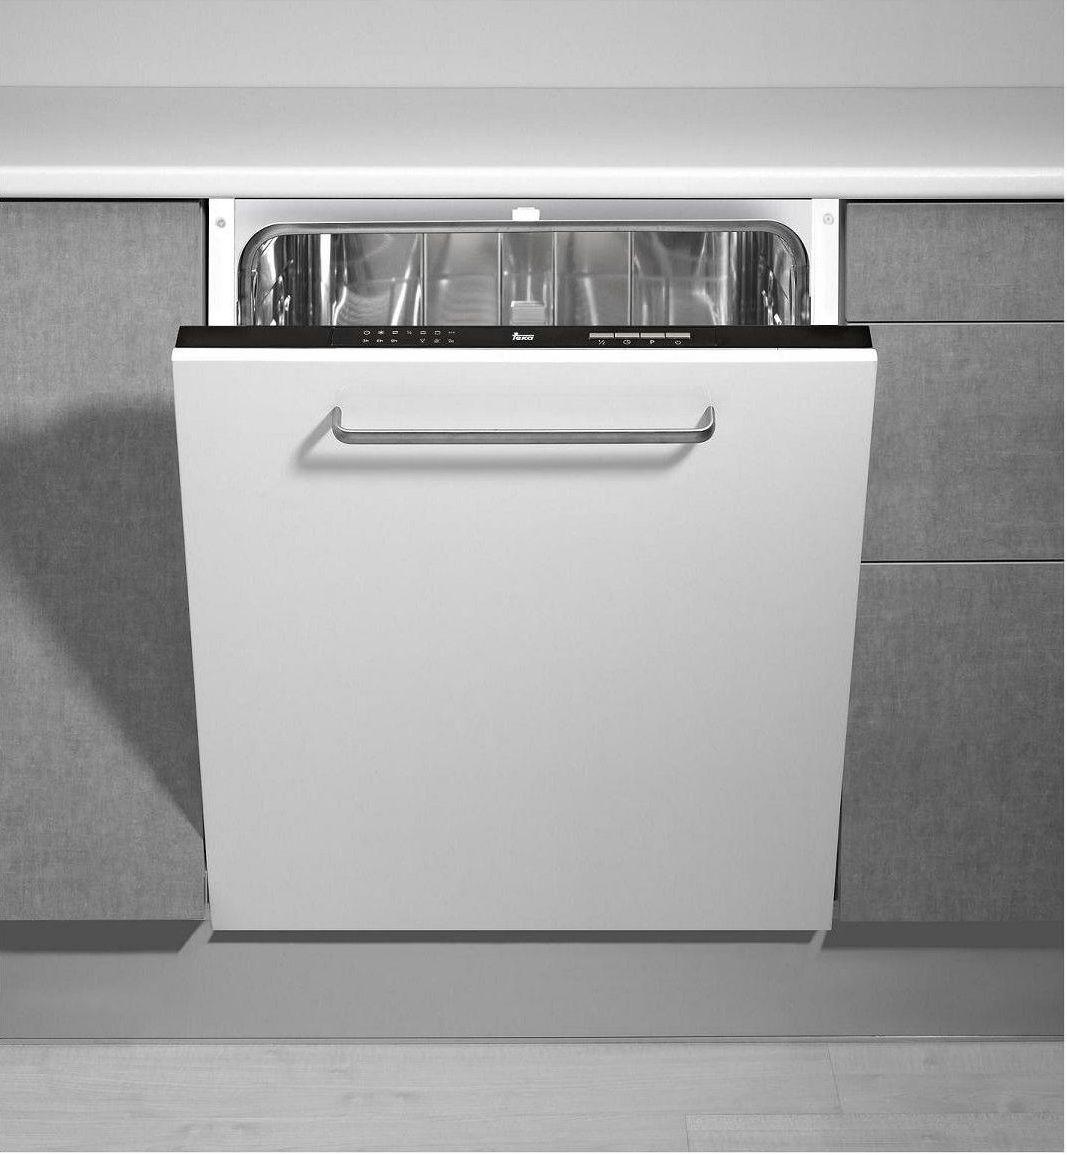 Masina de spalat vase complet incorporabila Teka DW1 605 FI de 60cm, 12 seturi, 6 programe